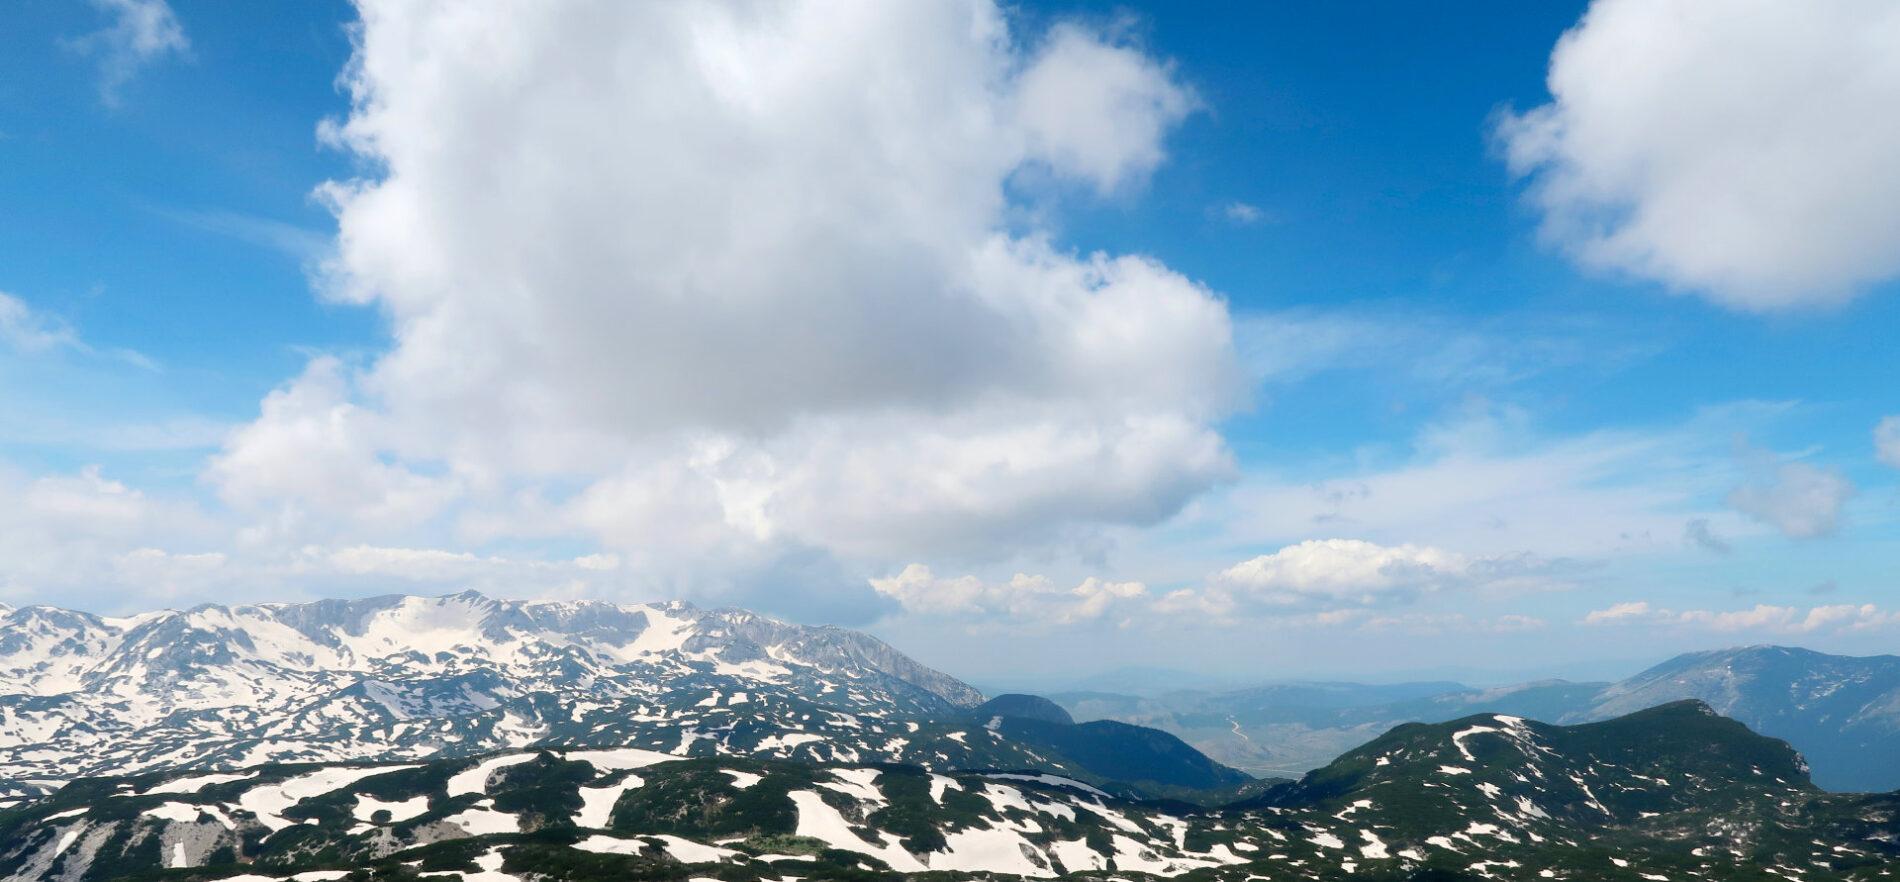 Heart mountains in Herzegovina. Photo: Sanjin Đumišić.